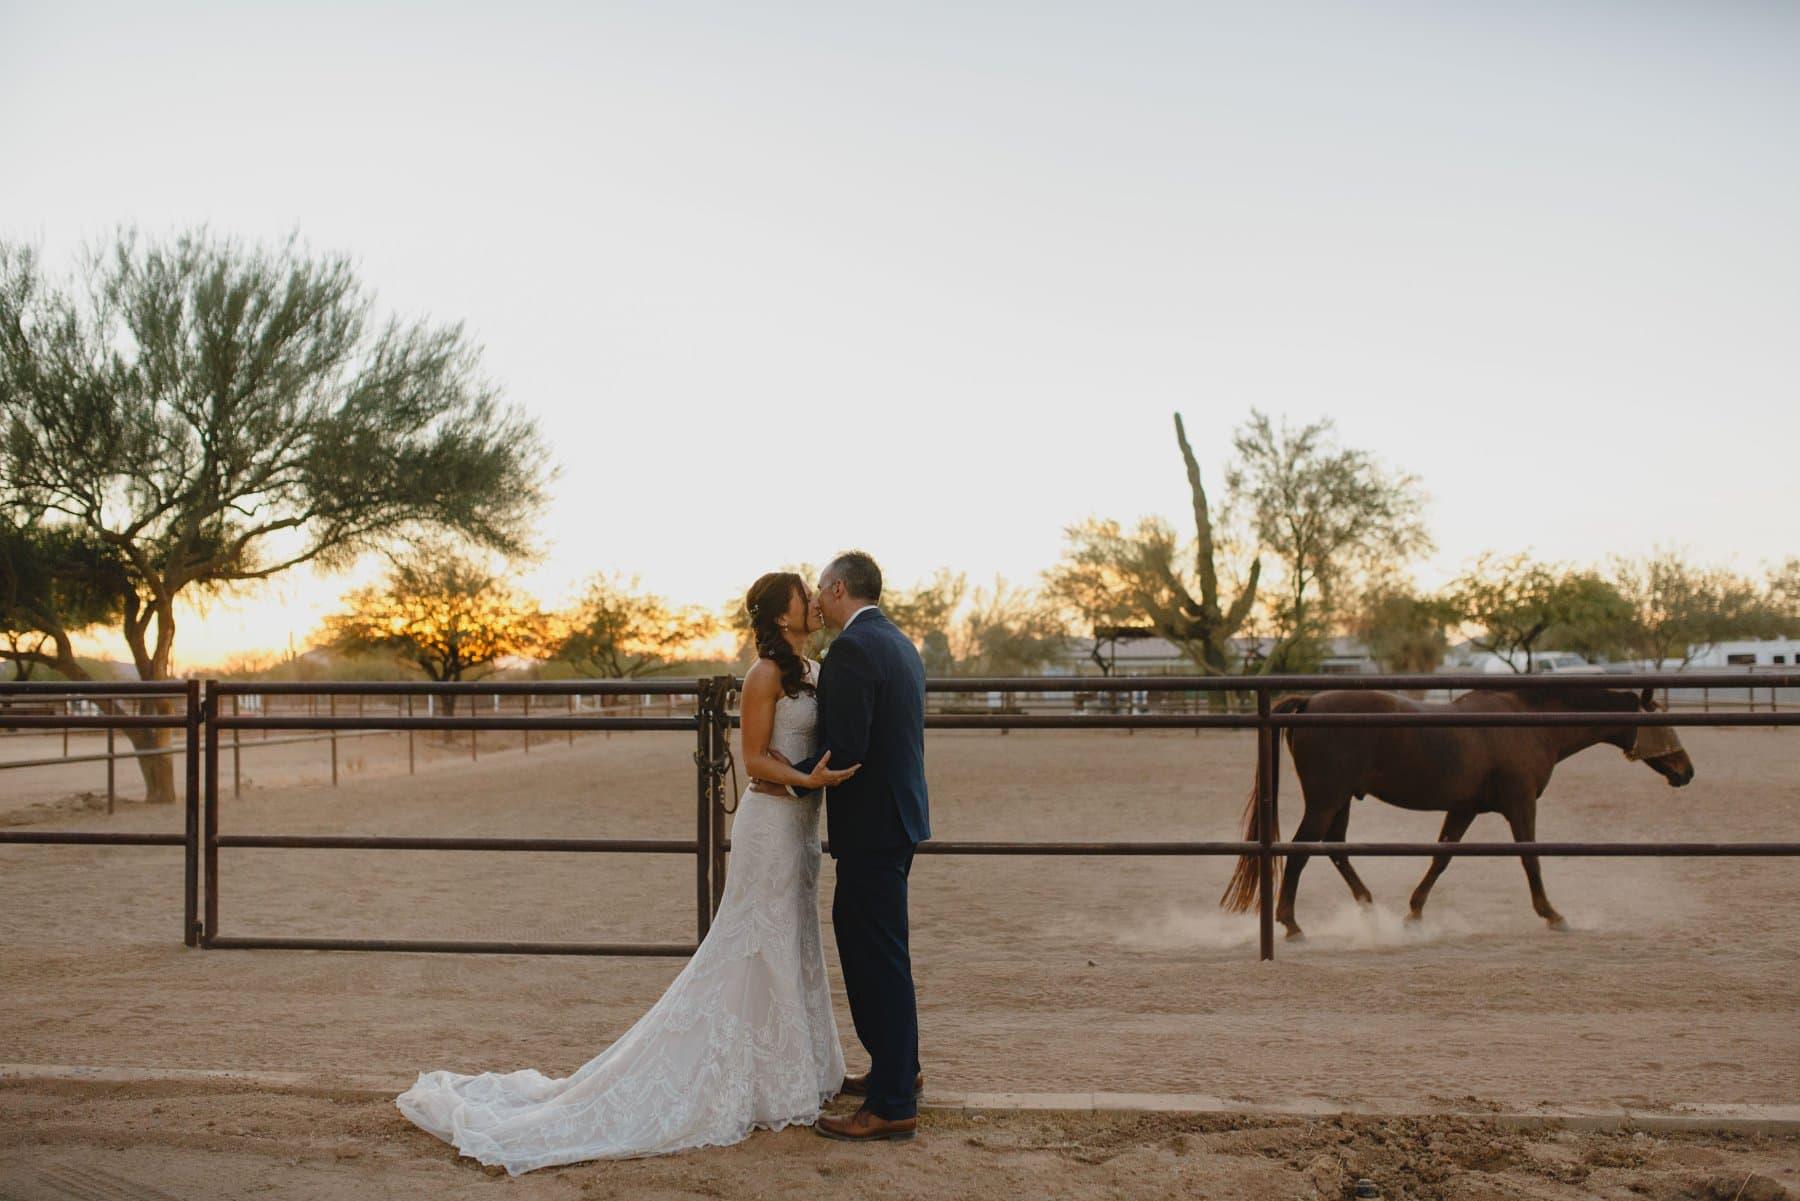 wedding at a horse barn in Arizona